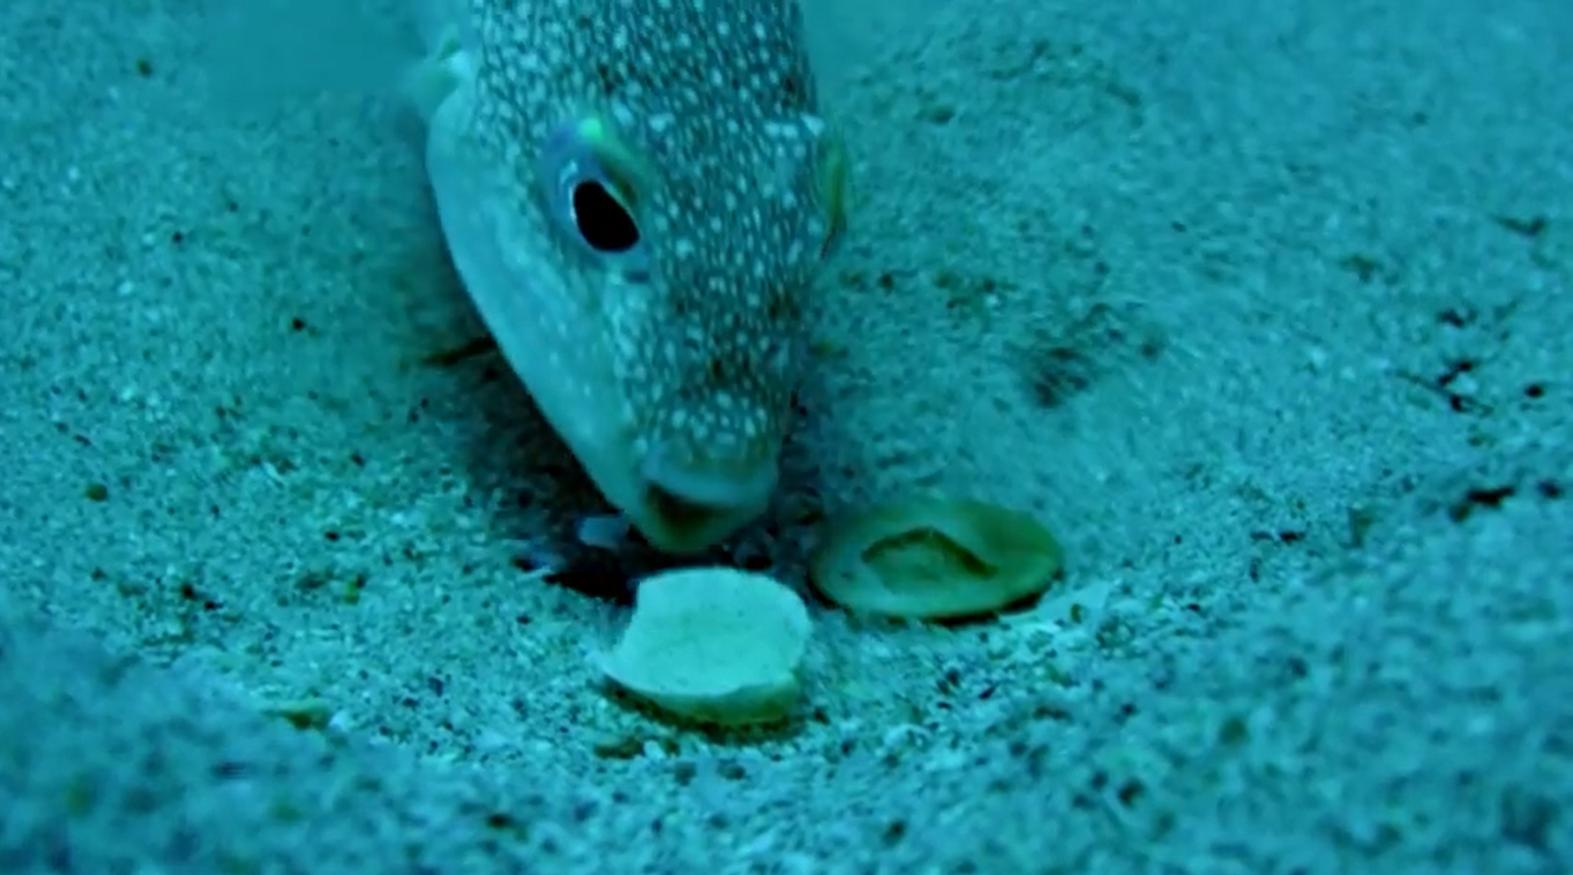 Pufferfish crafts astonishing underwater masterpiece that for Puffer fish sand art